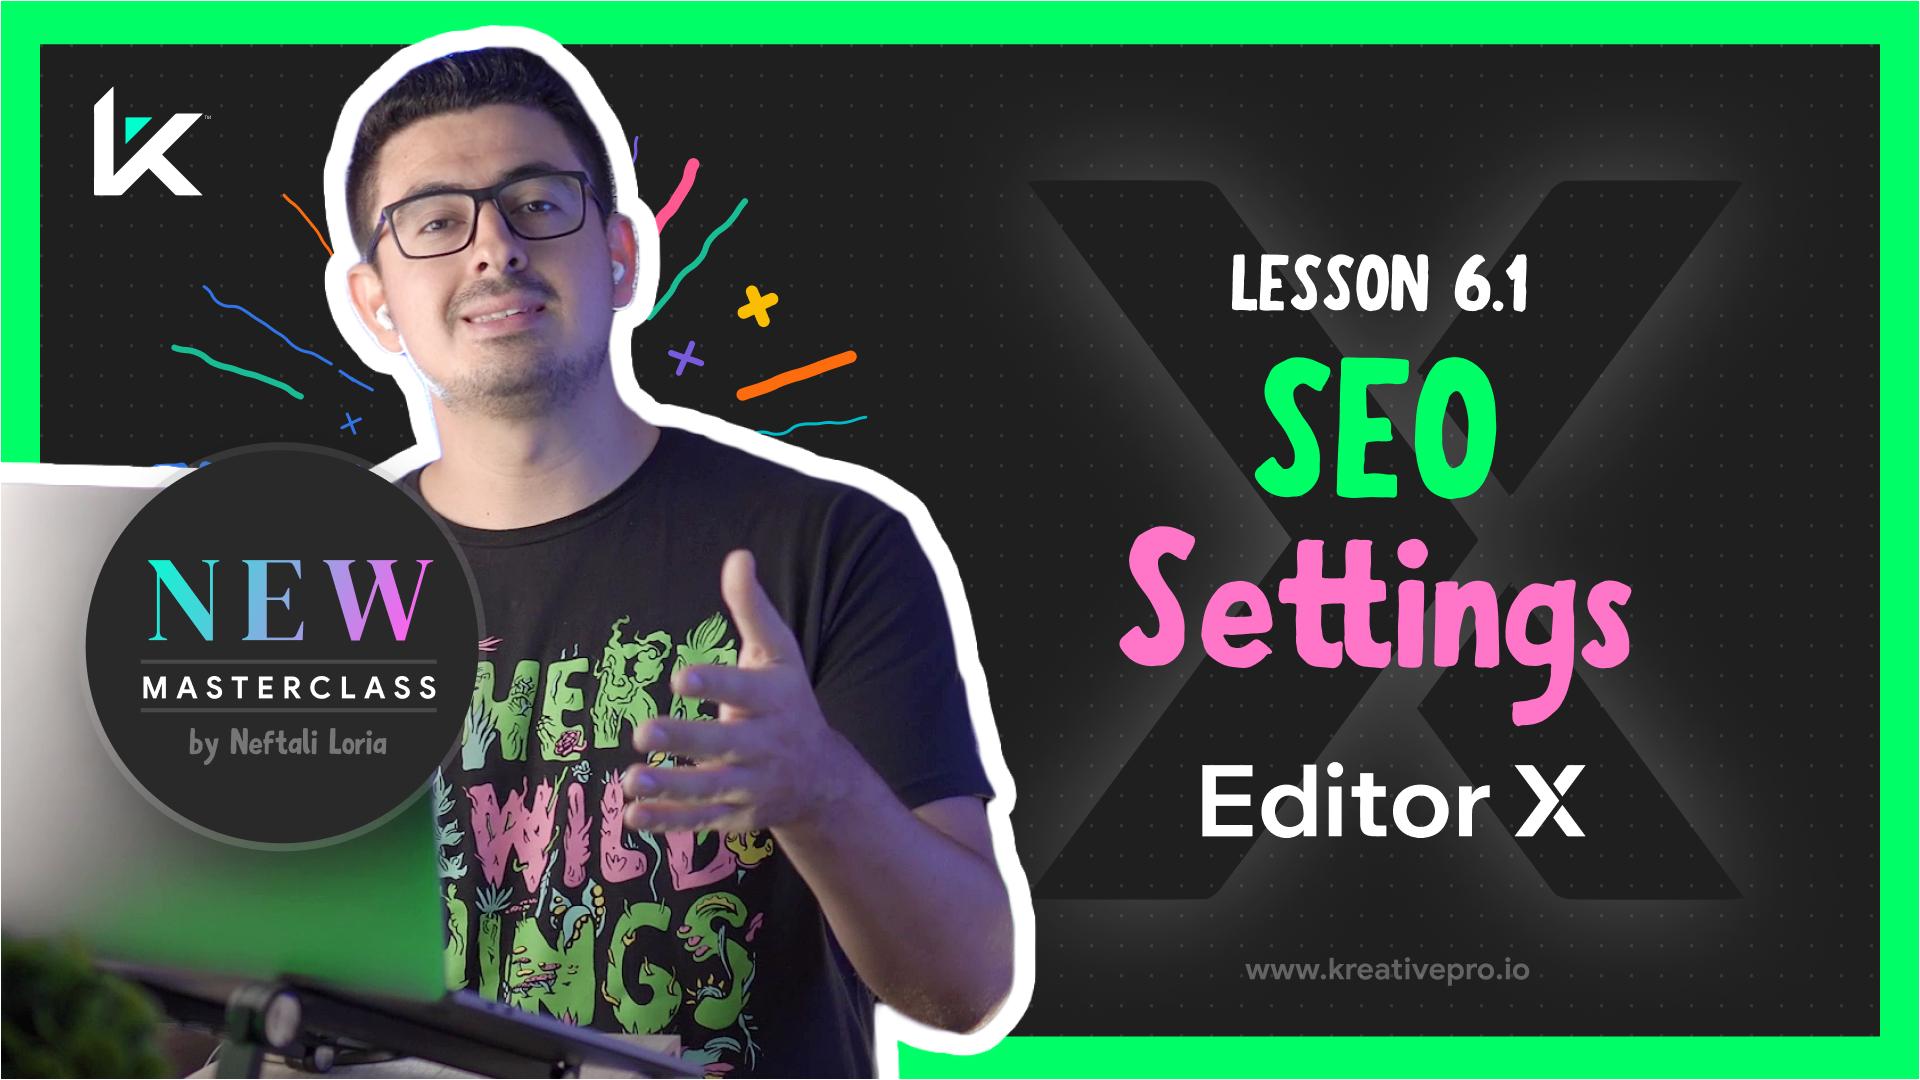 Editor X 6.1 - SEO Settings